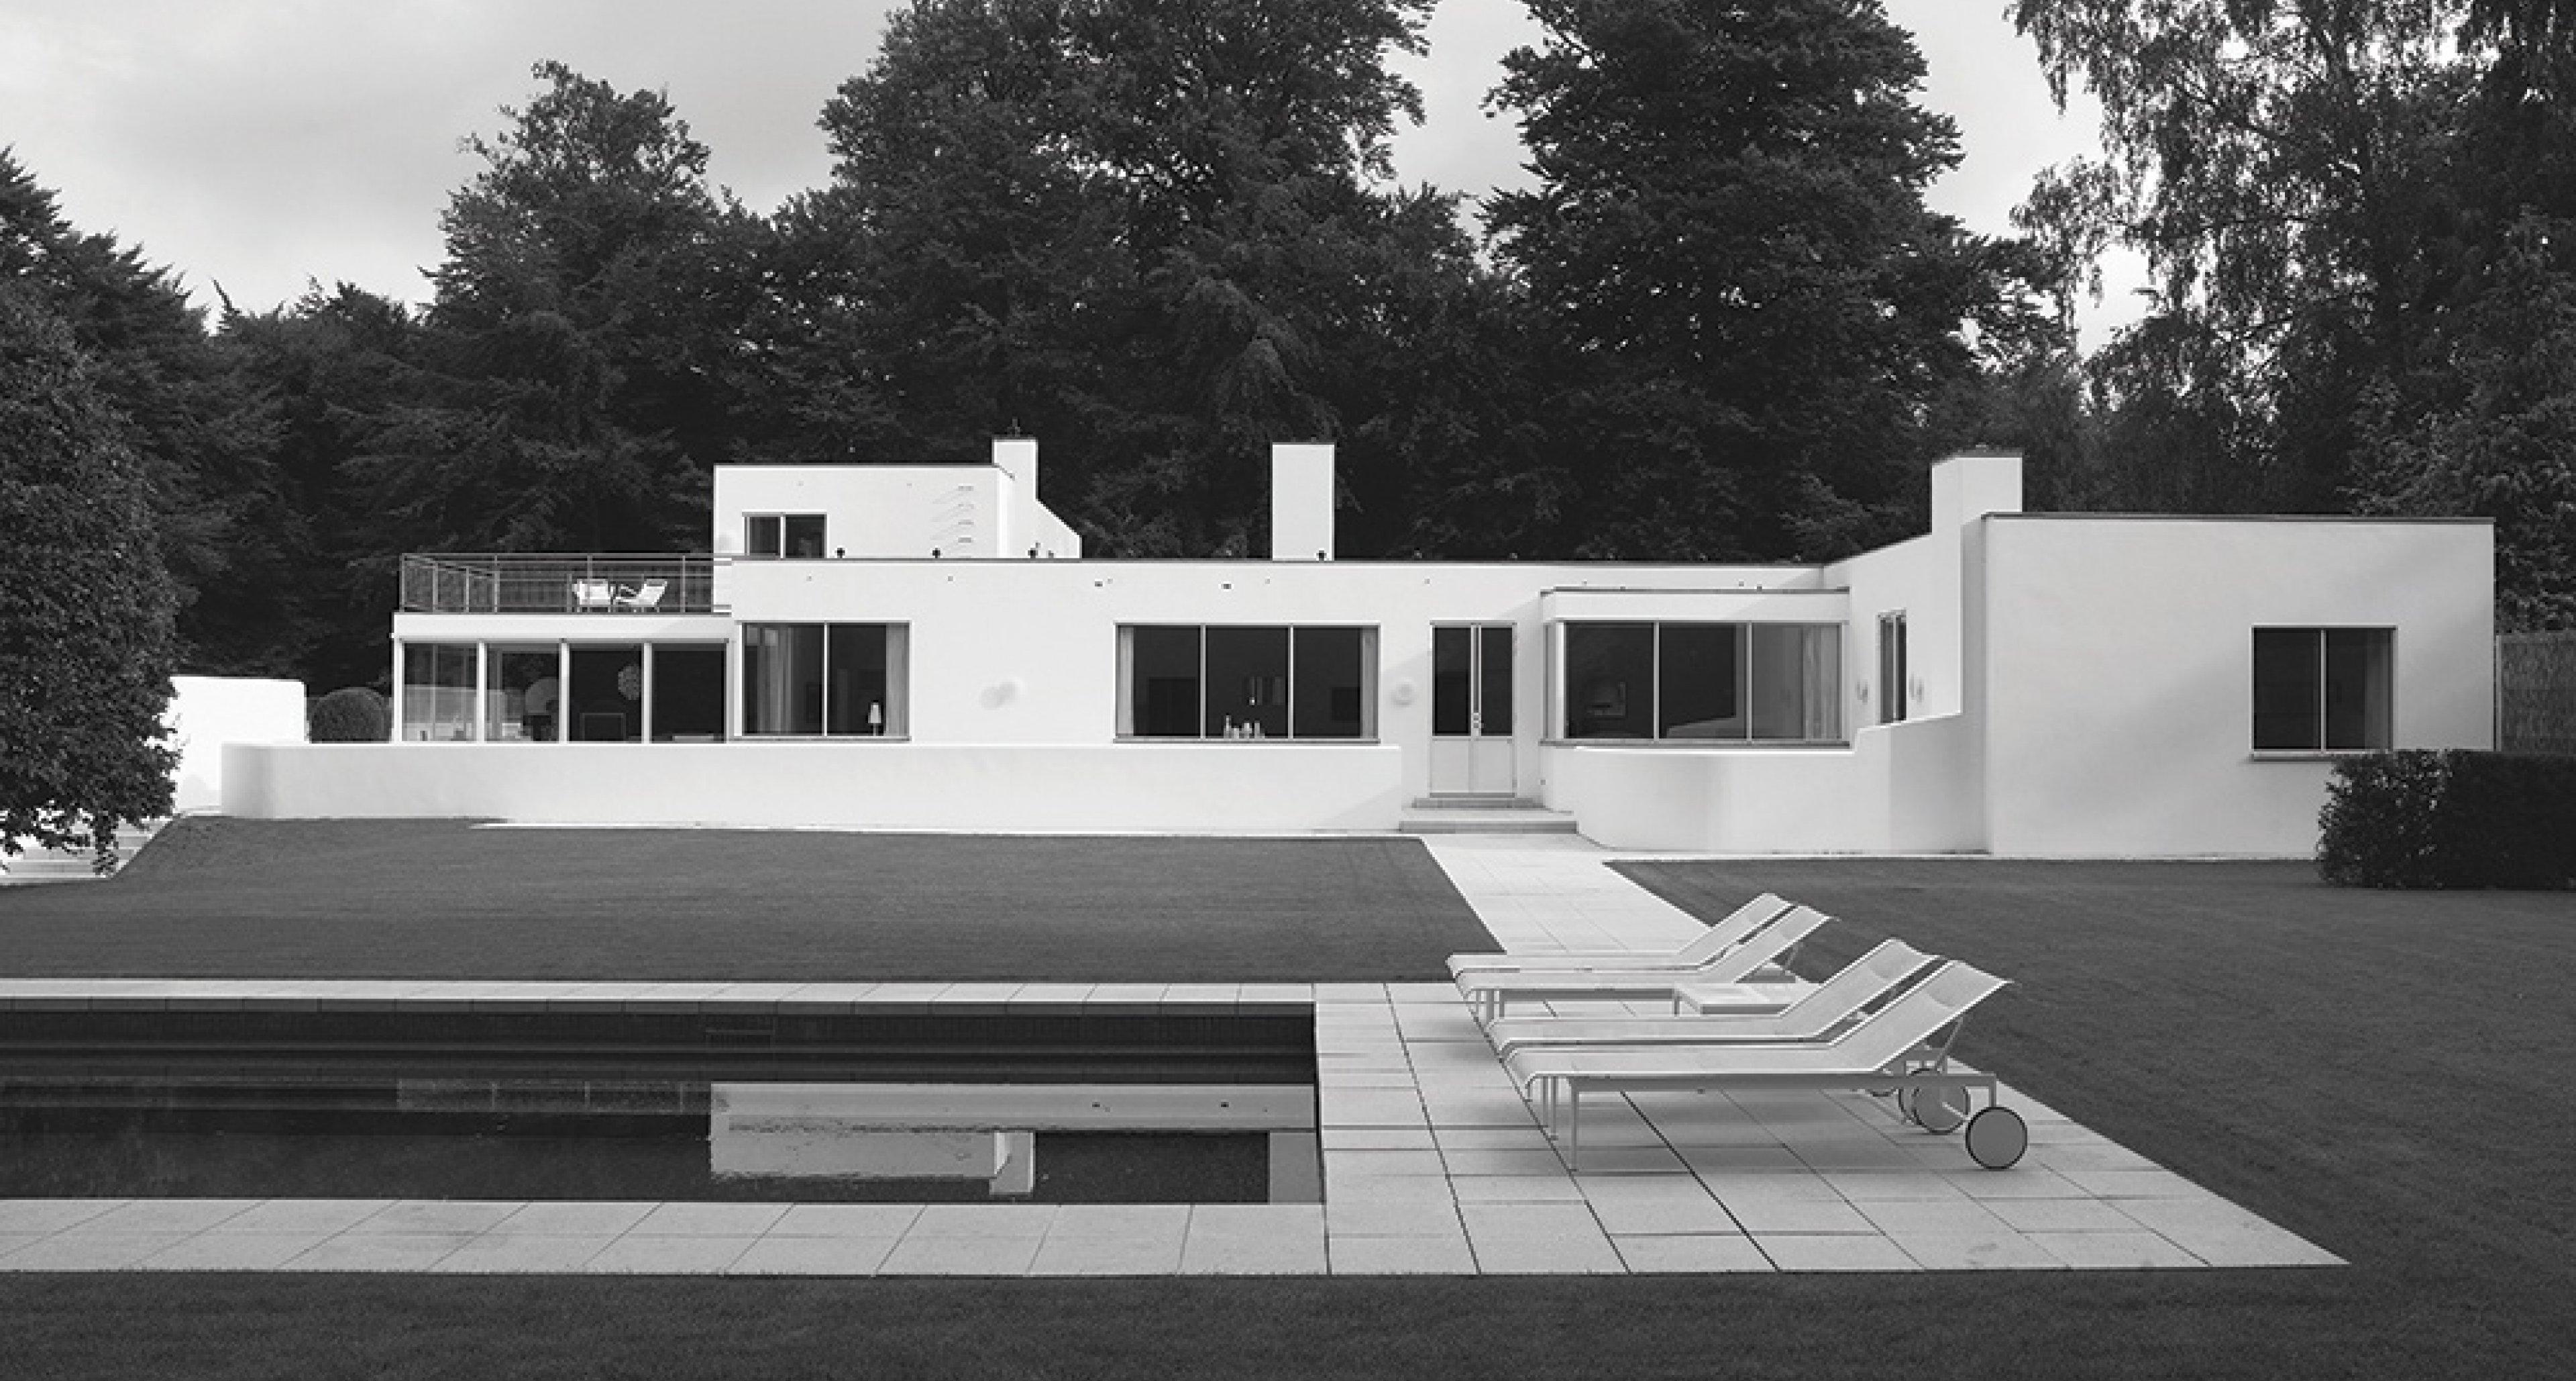 Arne Jacobsen: Rothenborg House, Klampenborg, Denmark, 1931. Picture credit: Richard Powers